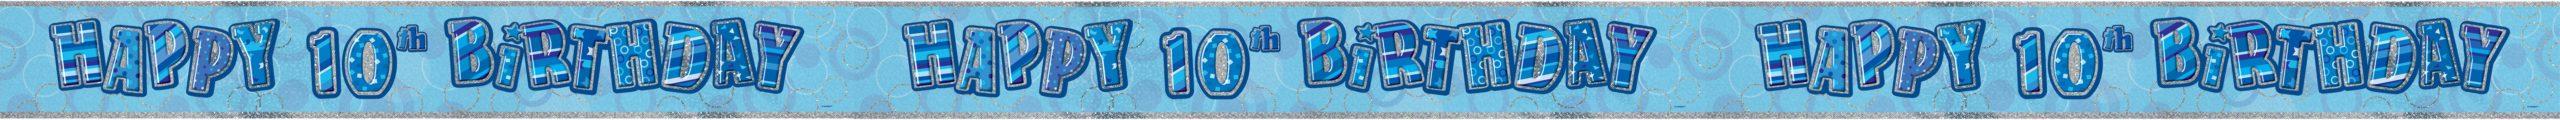 CB10BB1-1.jpg